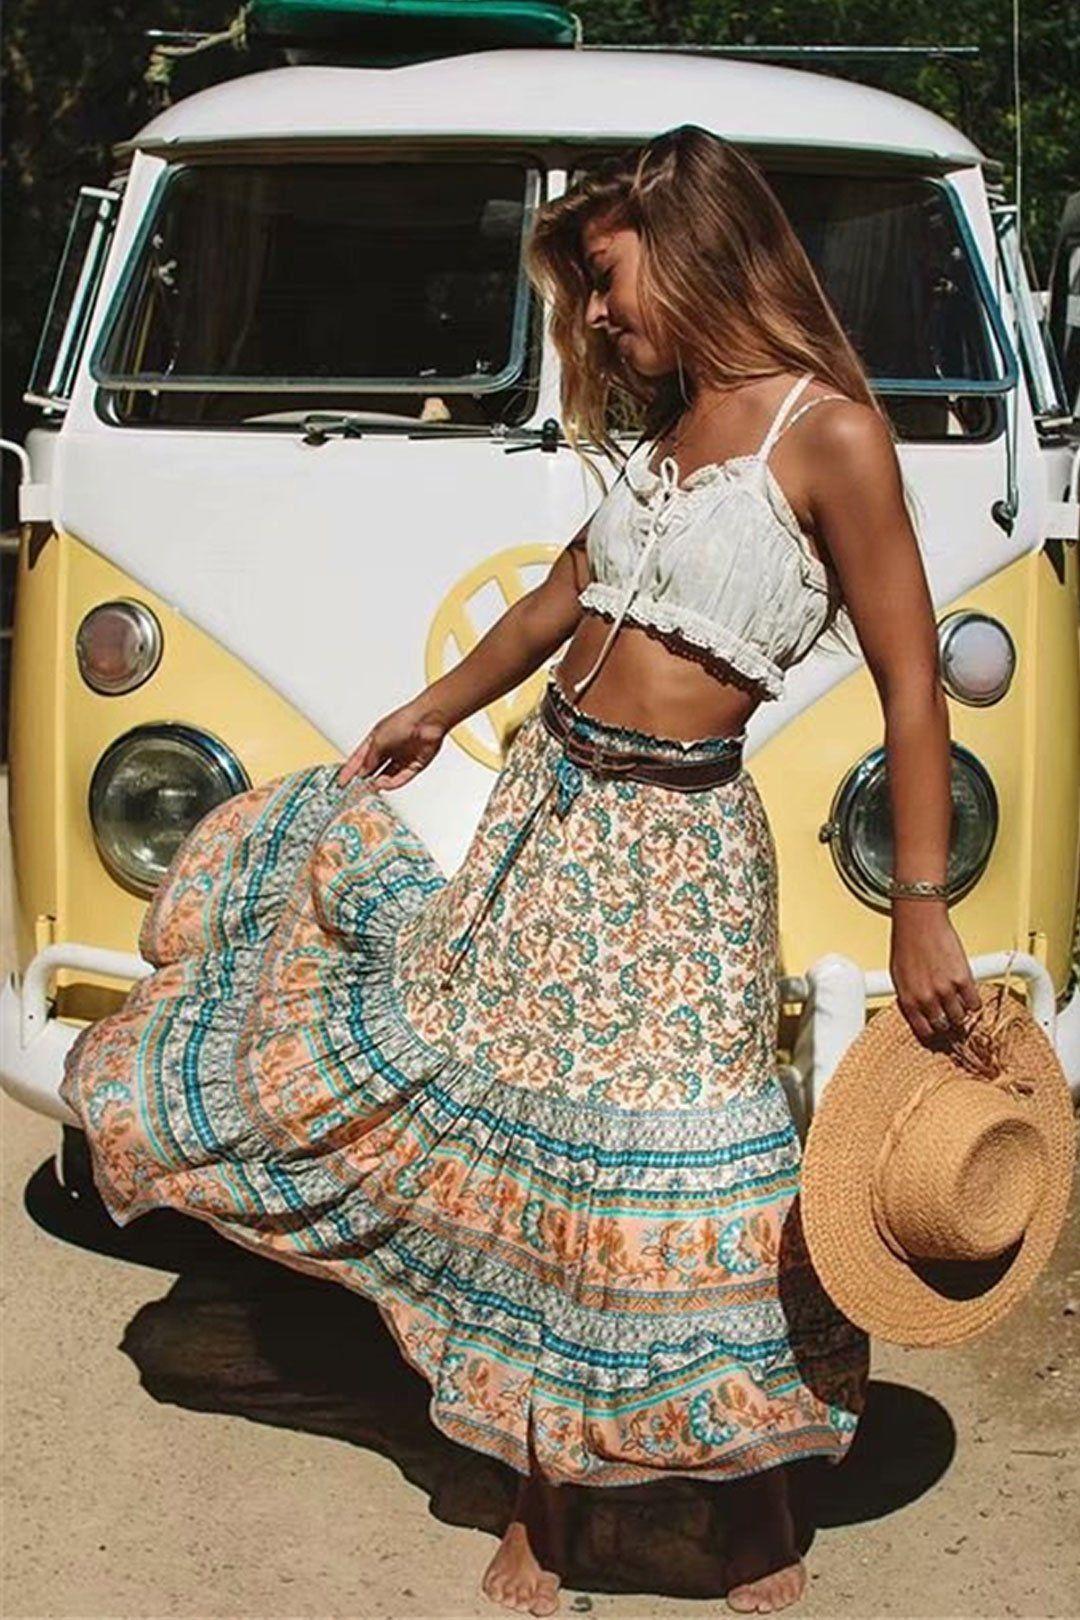 Boho Skirt, Maxi Skirt, Amelia in Viridian Only $27.99 + Free Shipping #bohochic #cottonroseboho #fashion #gypsy #boho #gypsysoul #hippiegirl #gypsyclothes #bohemian #discount